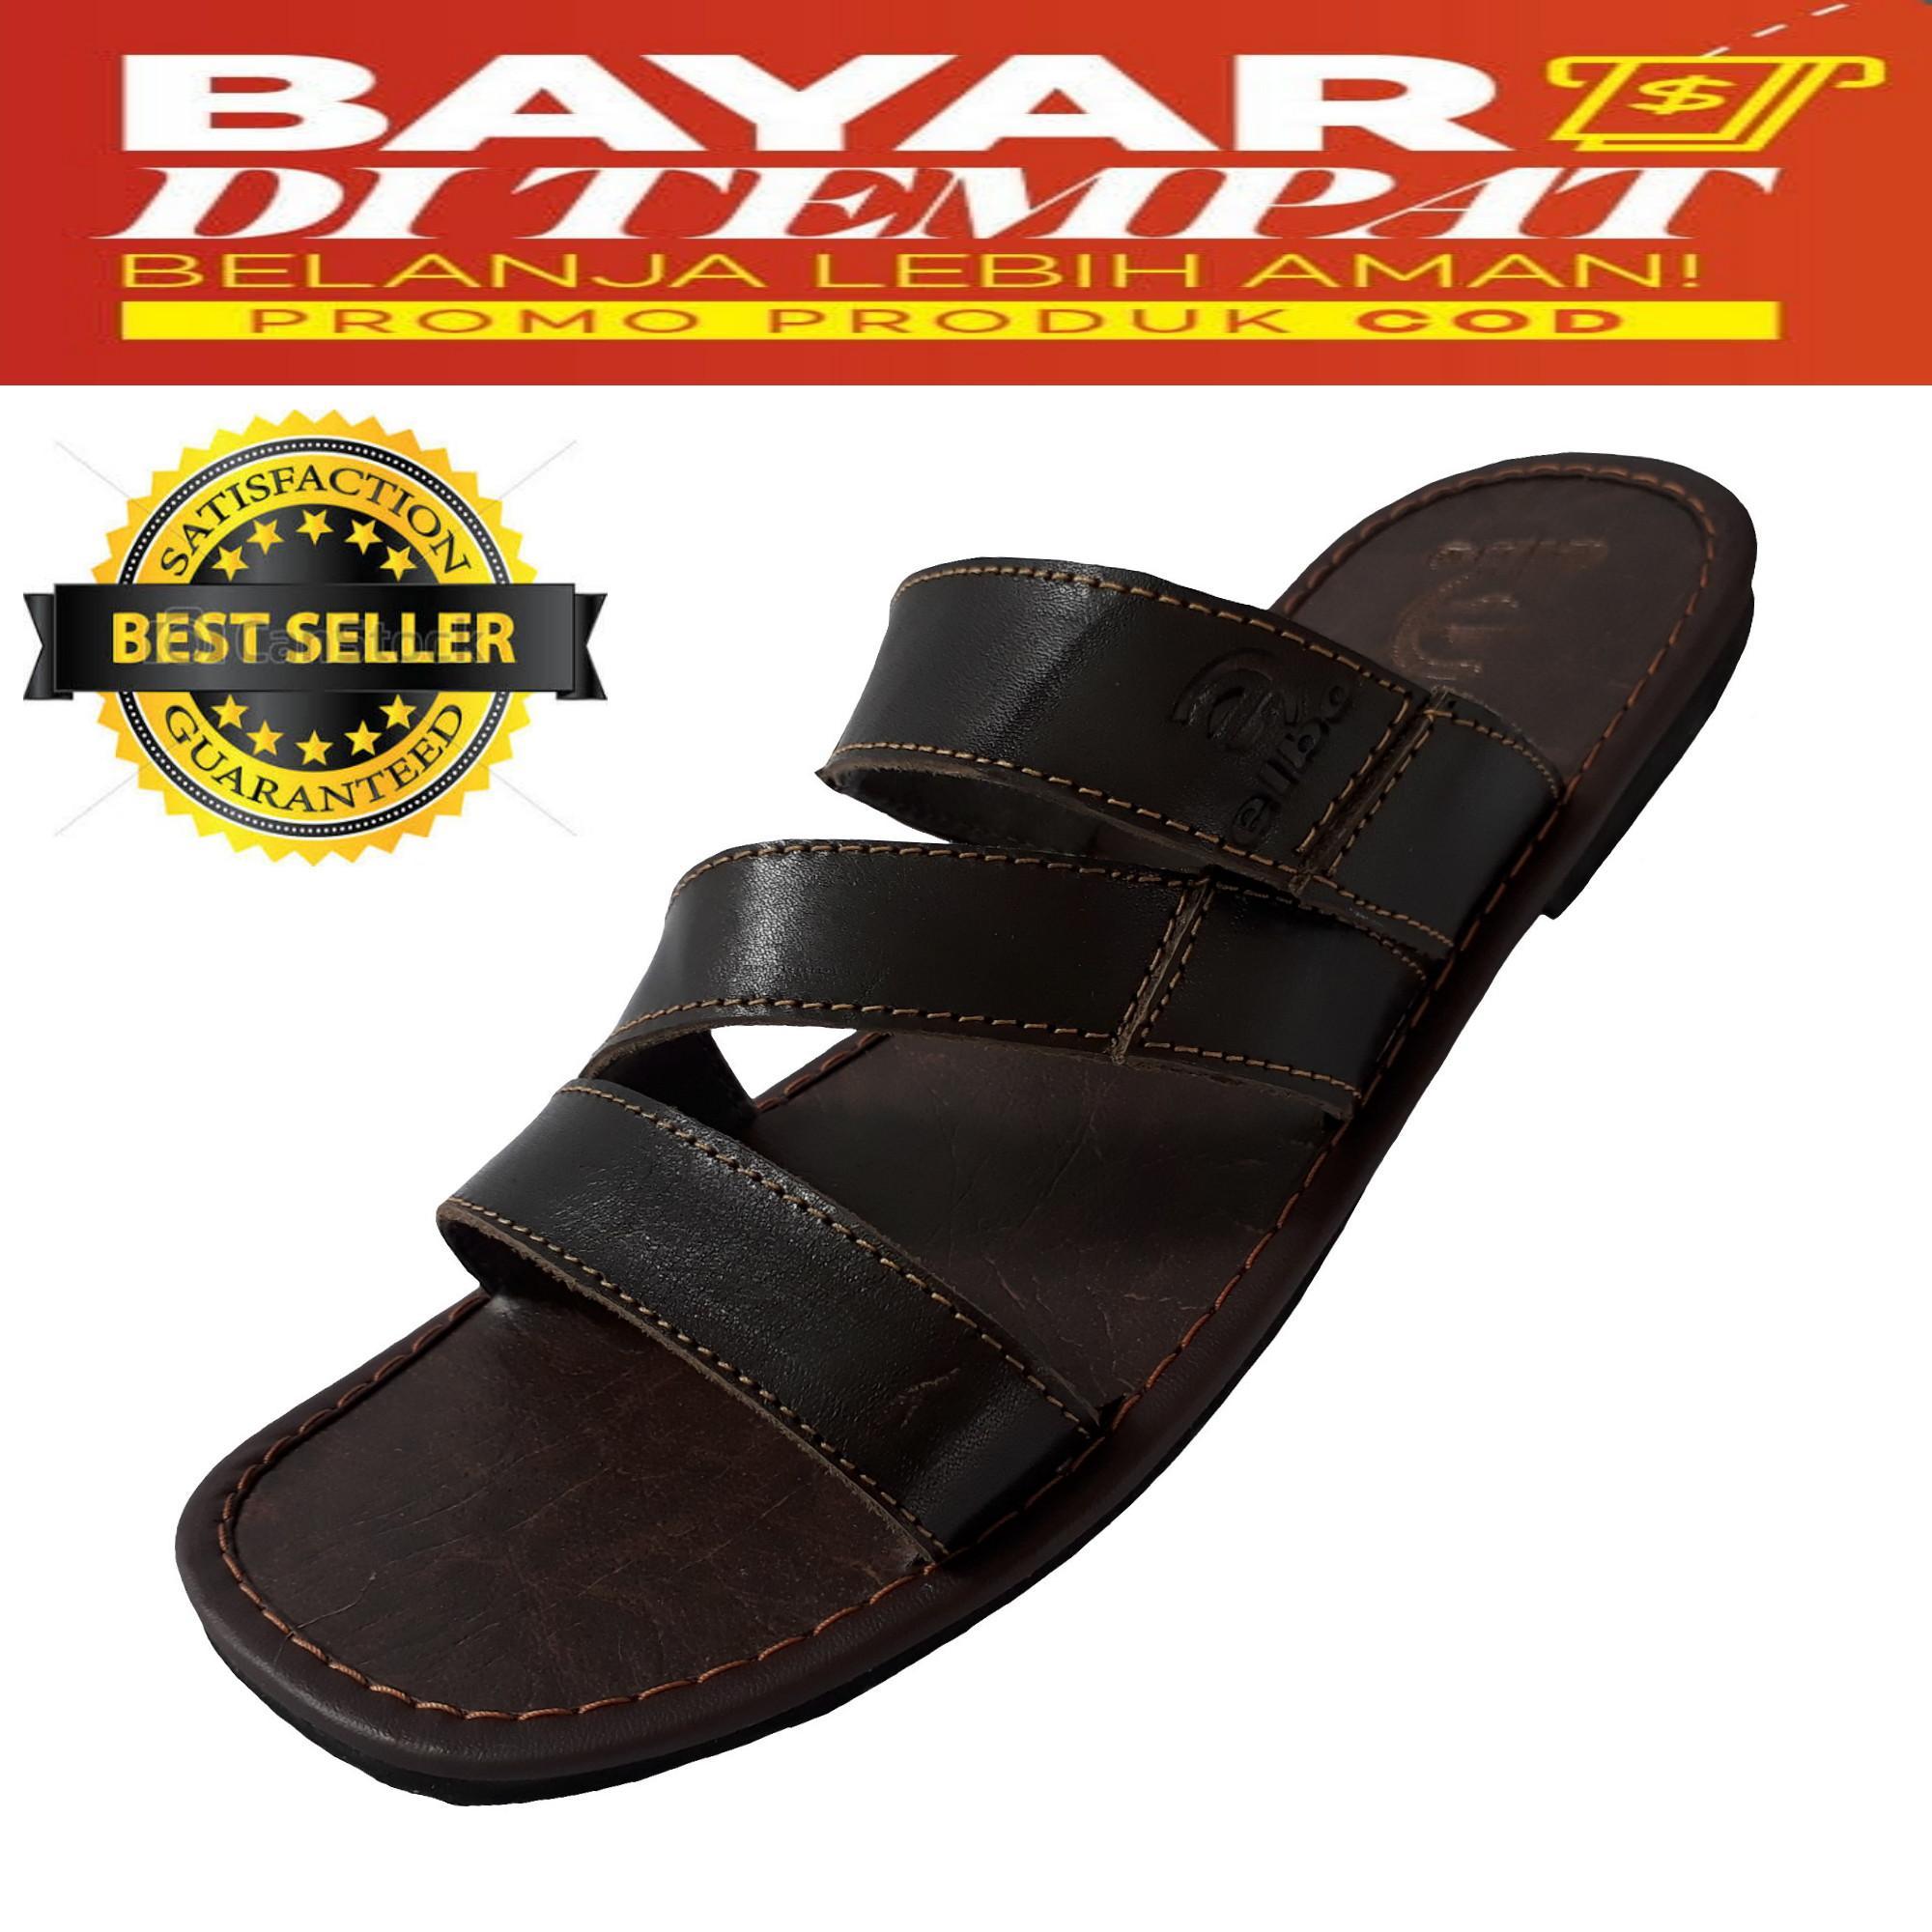 Sandal Pria Selop Ban3 Kulit Ukuran BIGSIZE/JUMBO 44-47 - Chocolate